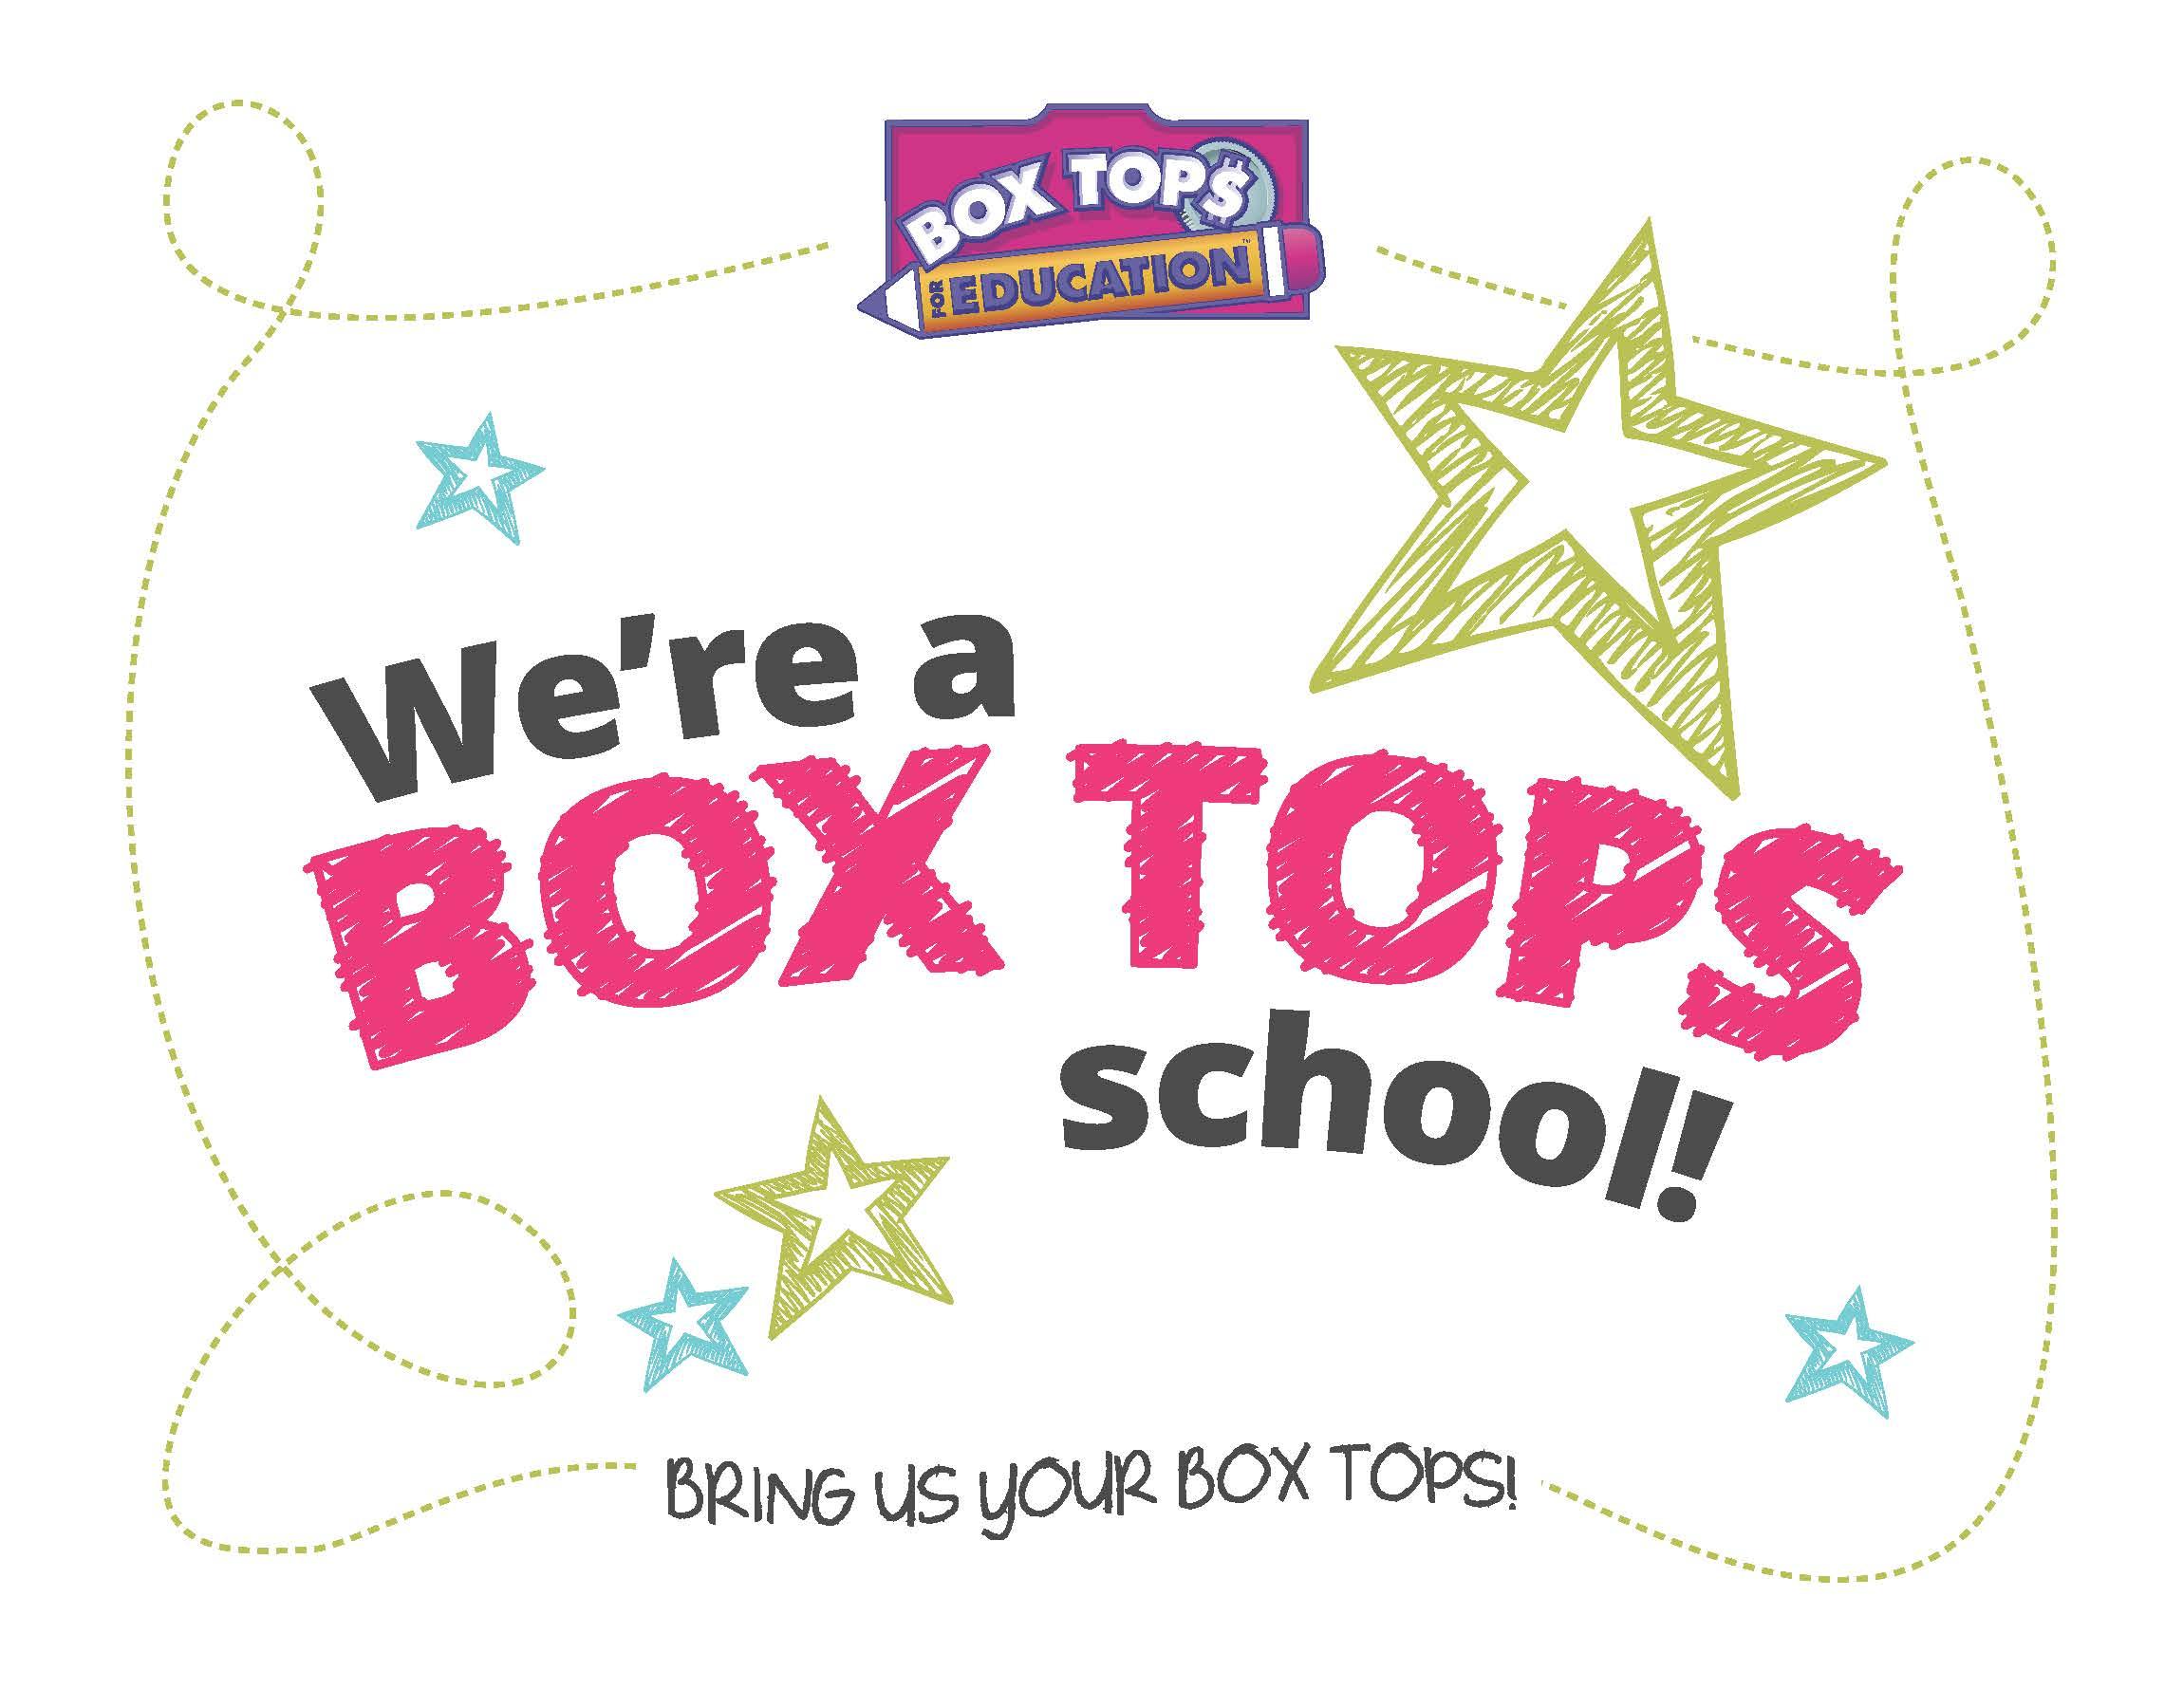 Box Tops For Education Clip Art Free | Lnkk - Free Printable Box Tops For Education